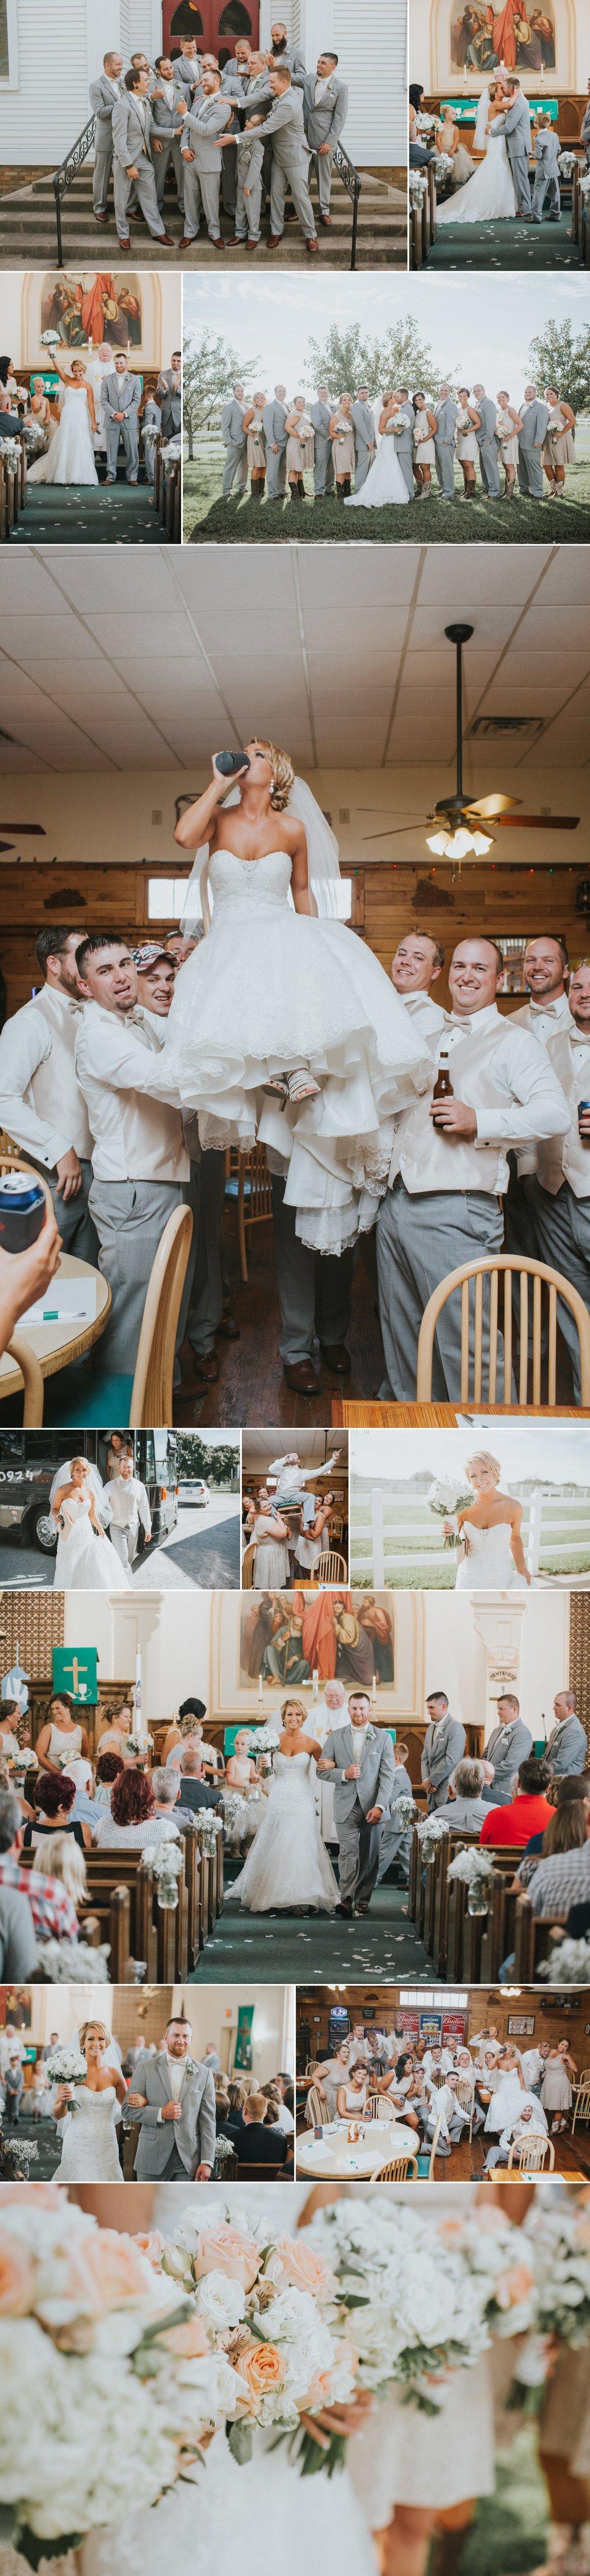 The Olson Wedding 3.jpg